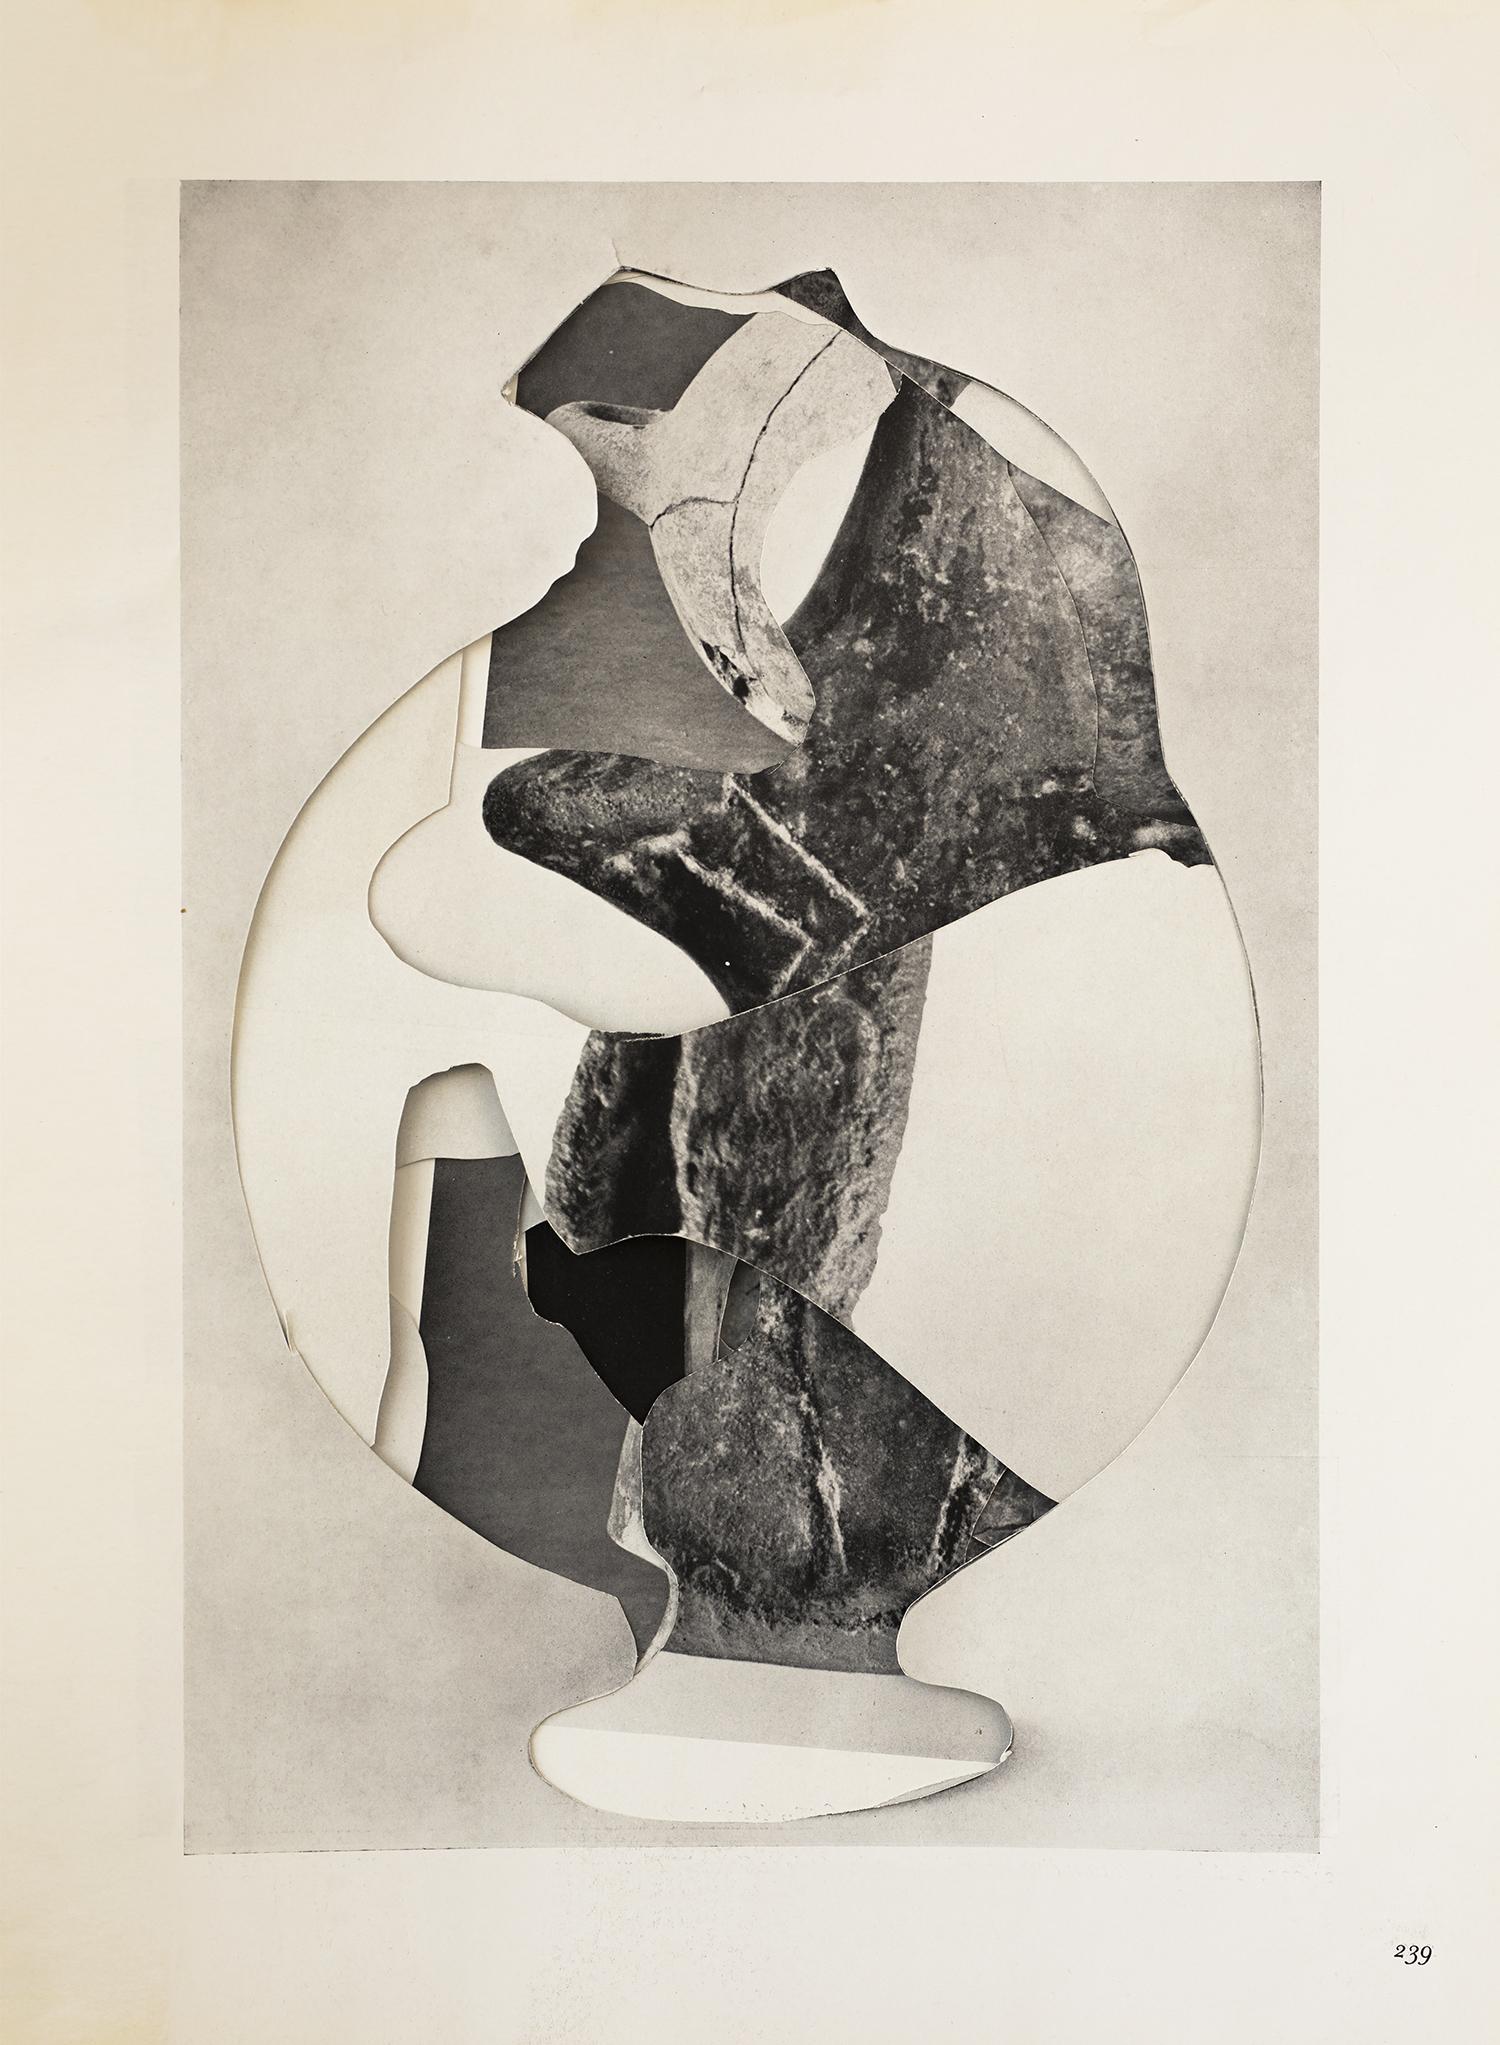 Gabriela Vainsencher. Page 239 , 2018. Archival inkjet print. 50 x 37 in.